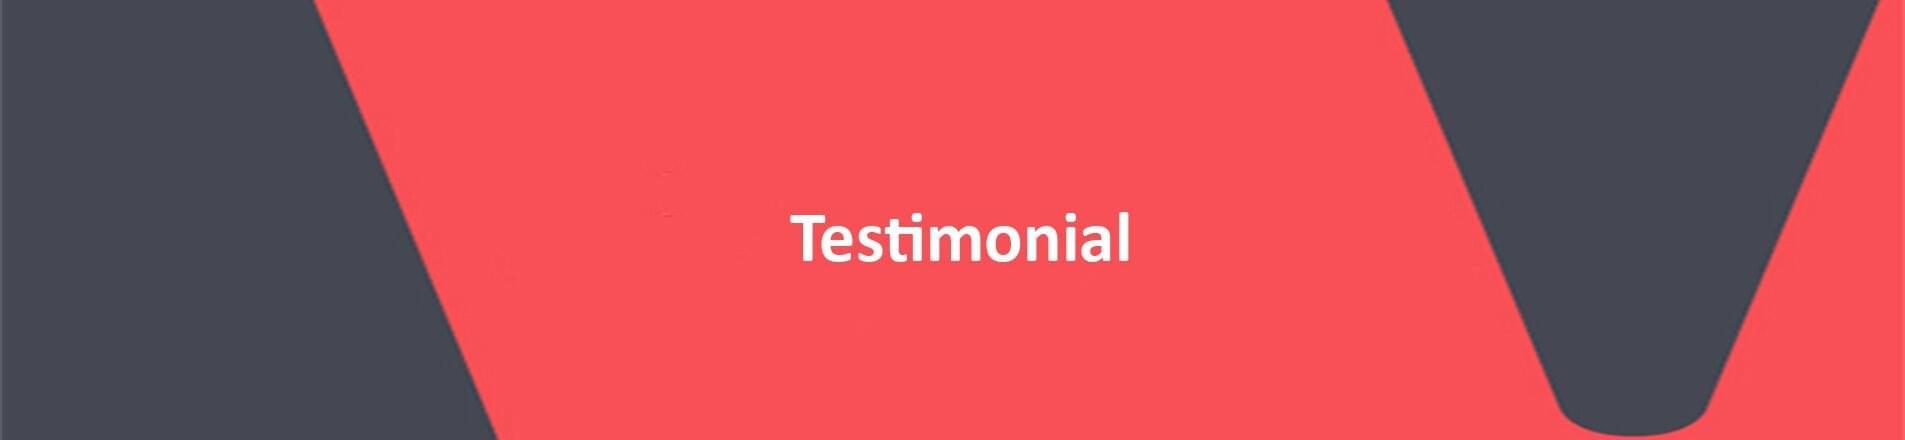 Testimonial on red VERCIDA background